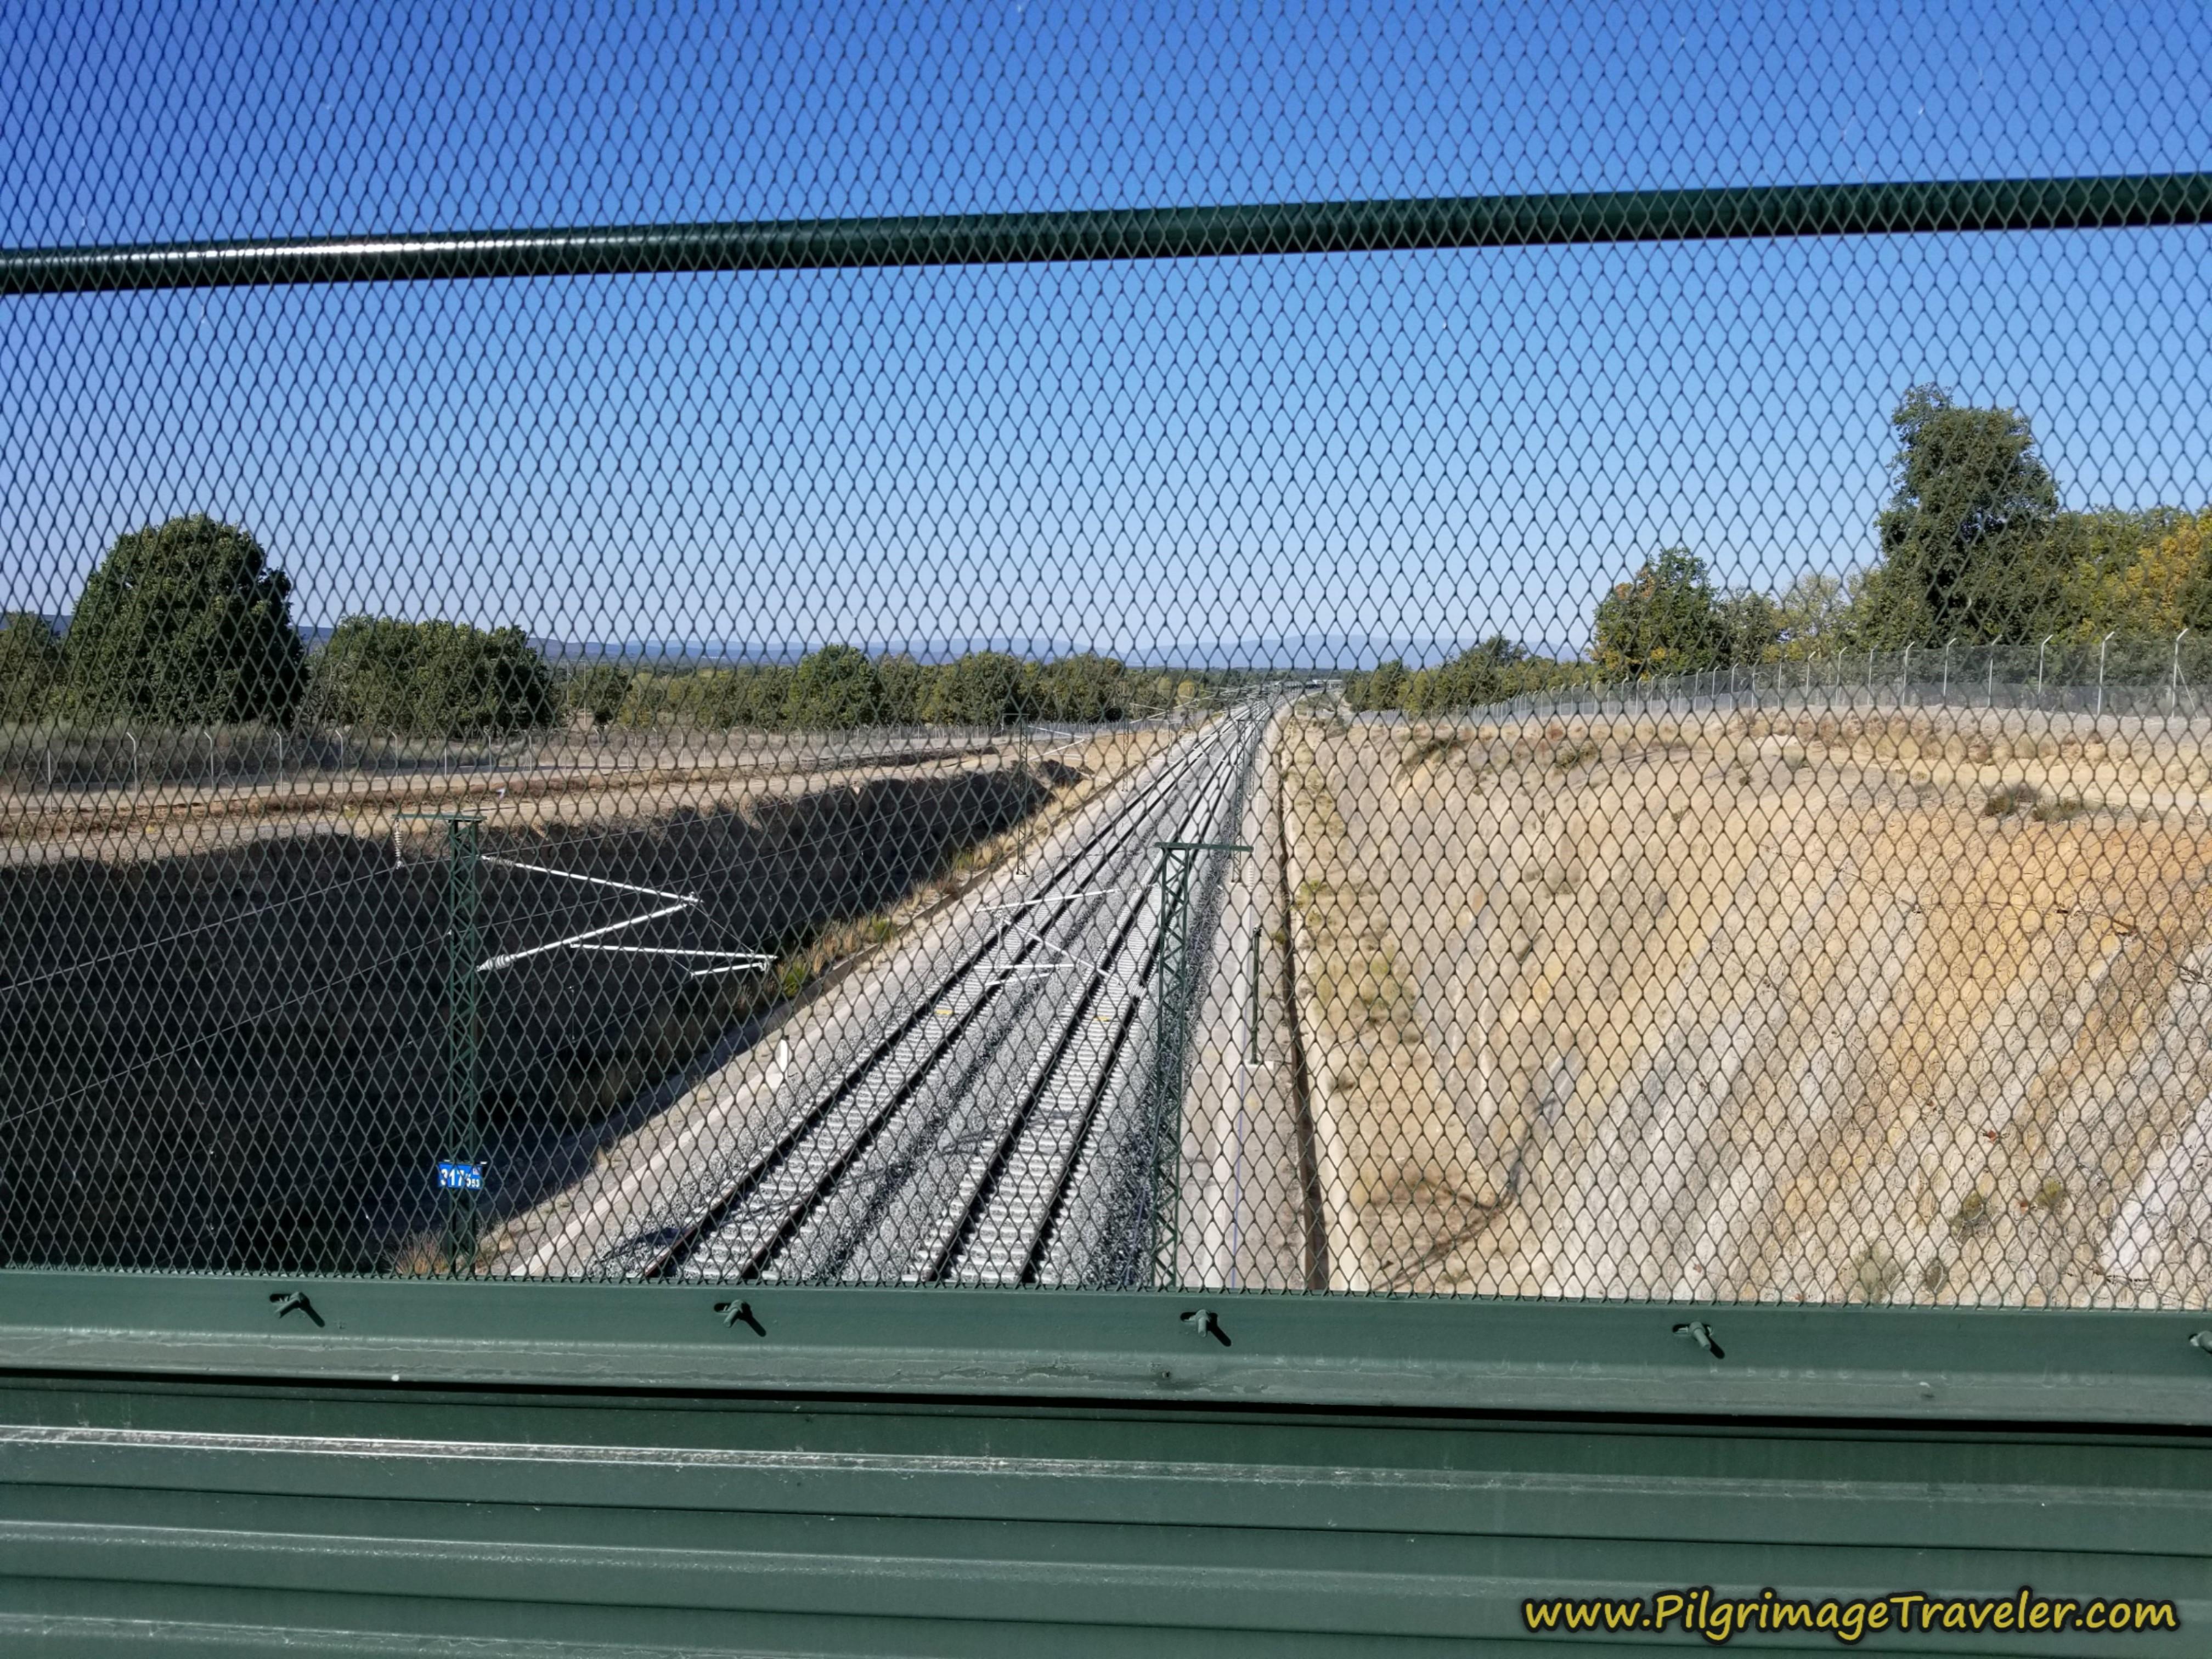 Cross Railroad Tracks on a Bridge on the Camino Sanabrés from Rionegro del Puente to Entrepeñas